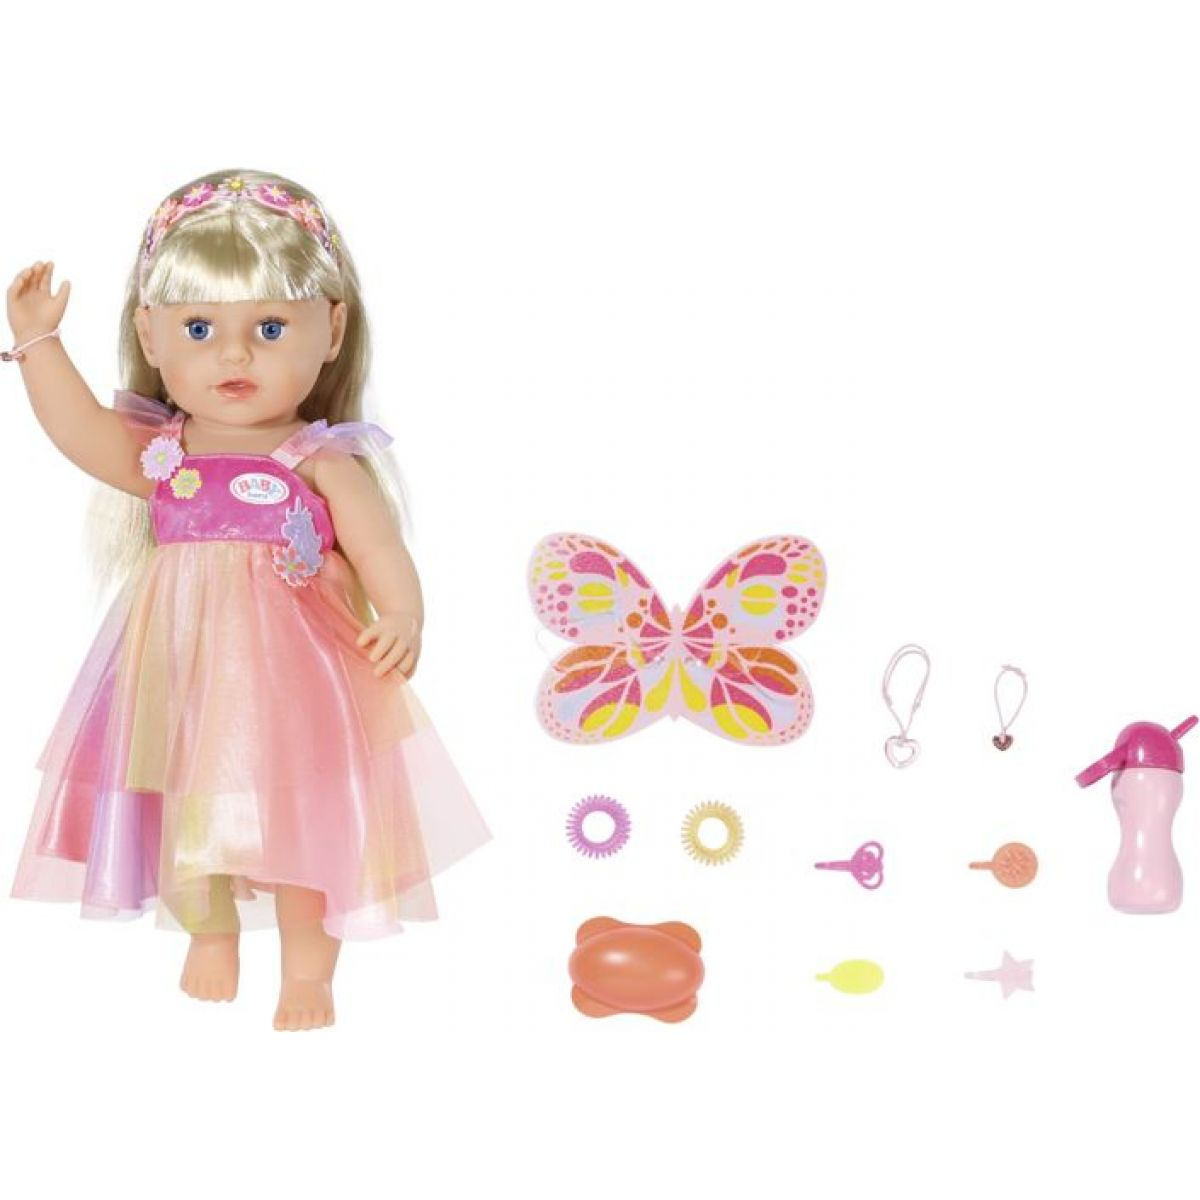 Staršie sestrička BABY born Soft Touch Jednorožec, 43 cm